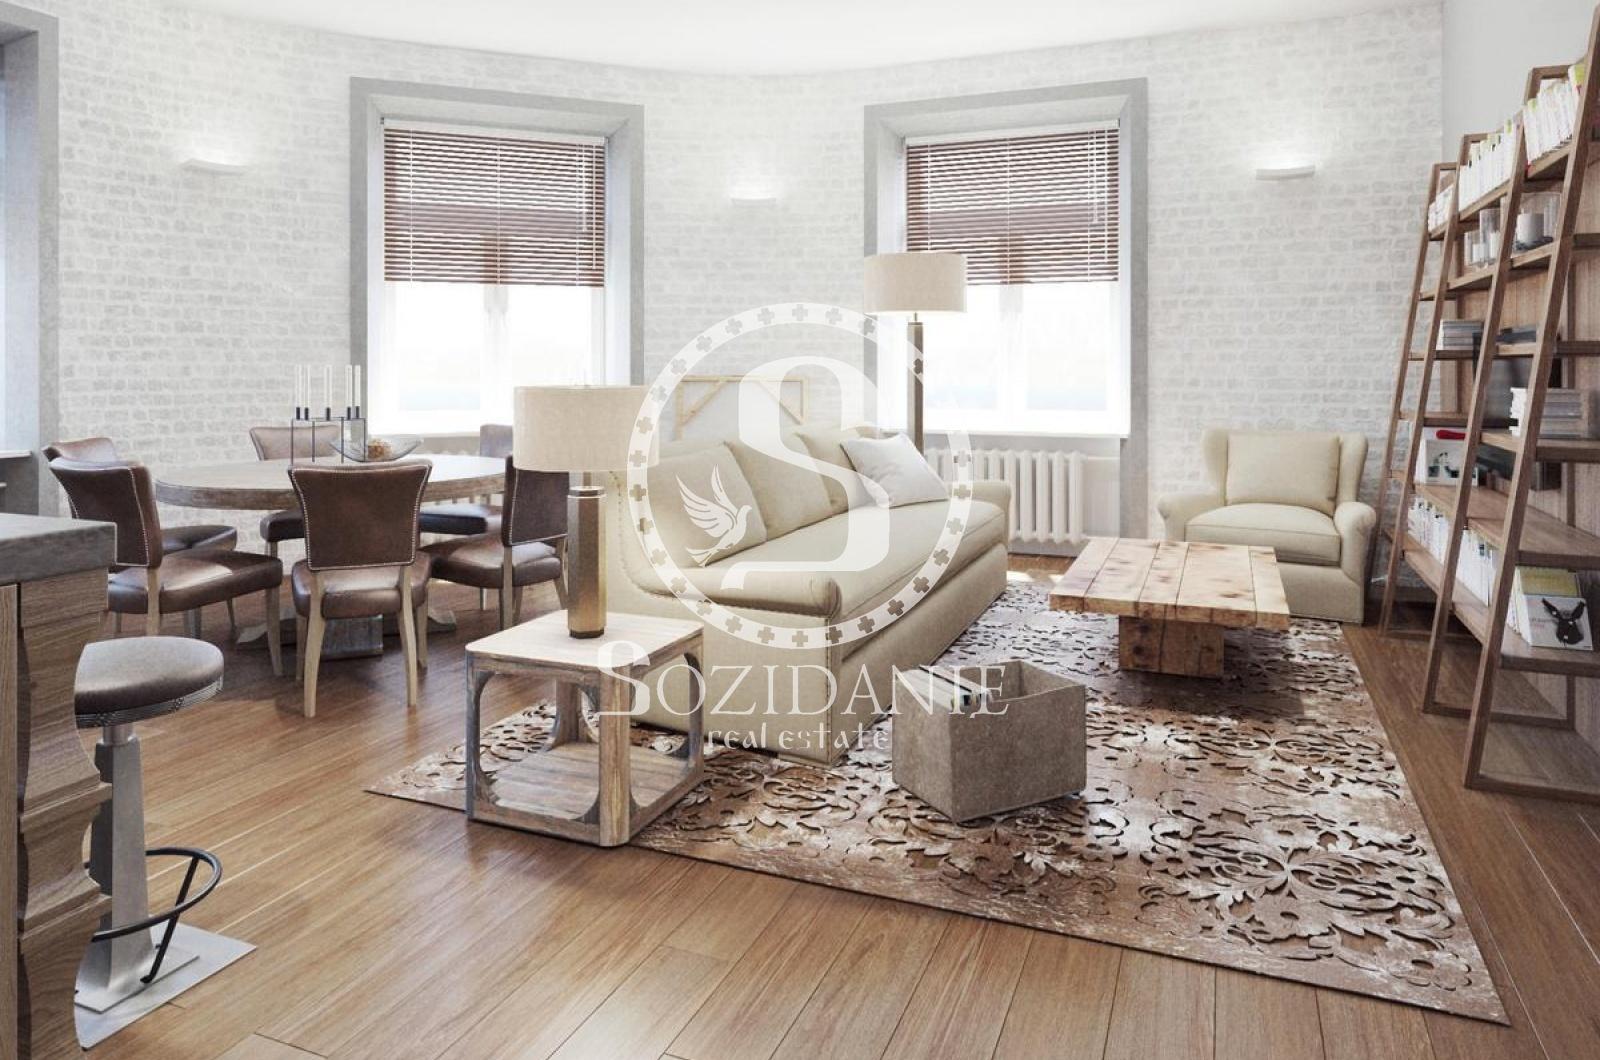 4 Комнаты, Городская, Продажа, Улица Солянка, Listing ID 3416, Москва, Россия,